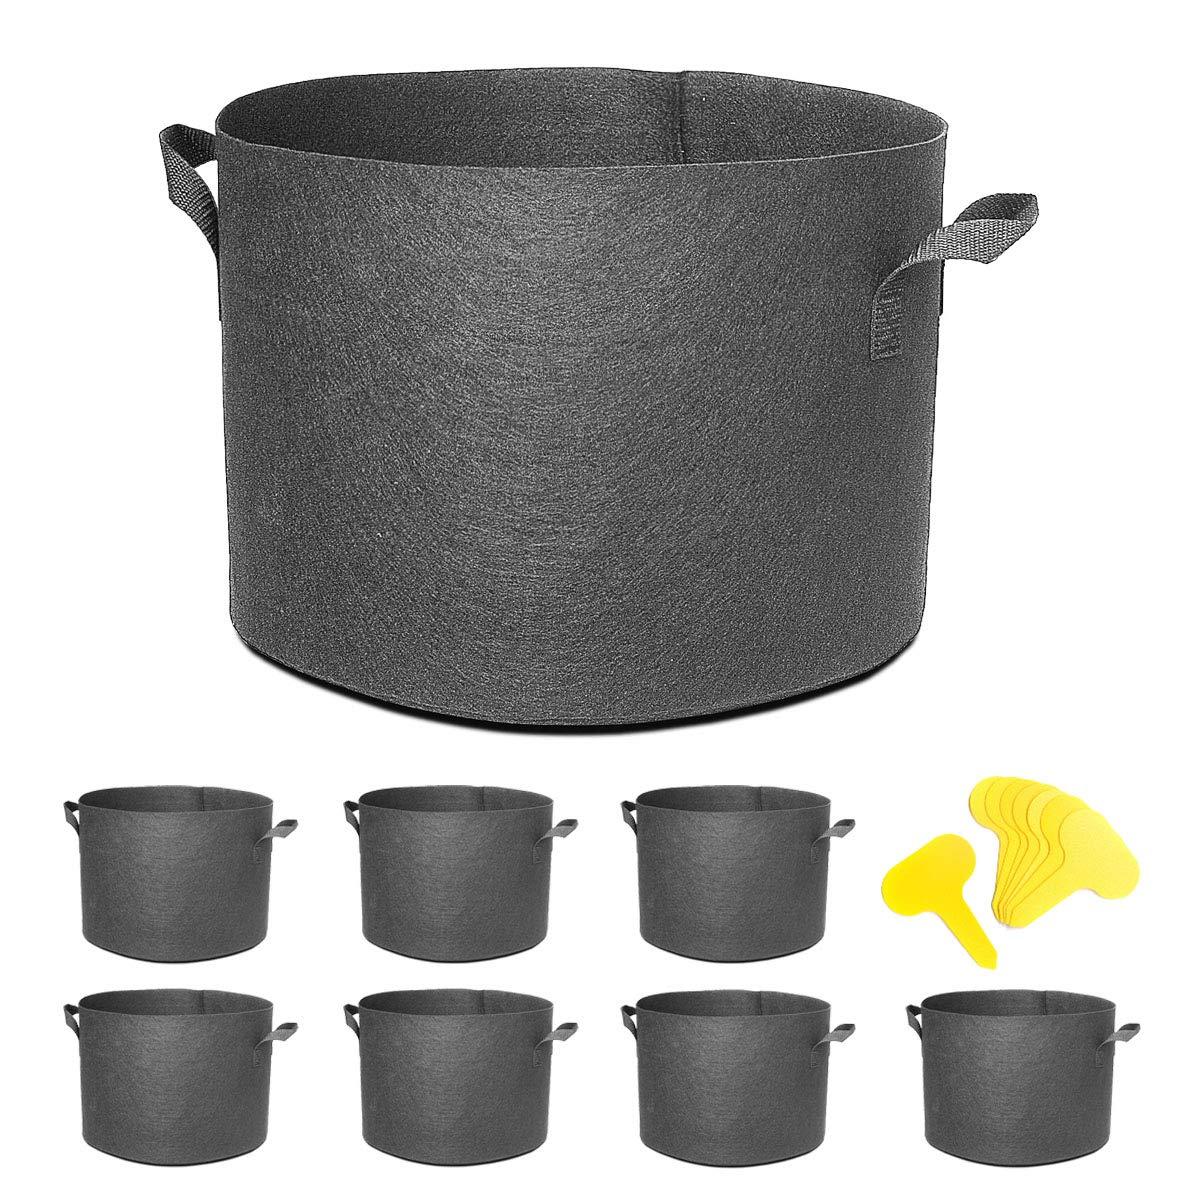 5 Gallon 8-Pack Plant Pot Black Grow Bags Fabric Pots for Potato Tomato Vegetables Planting W Handles Hydroponics